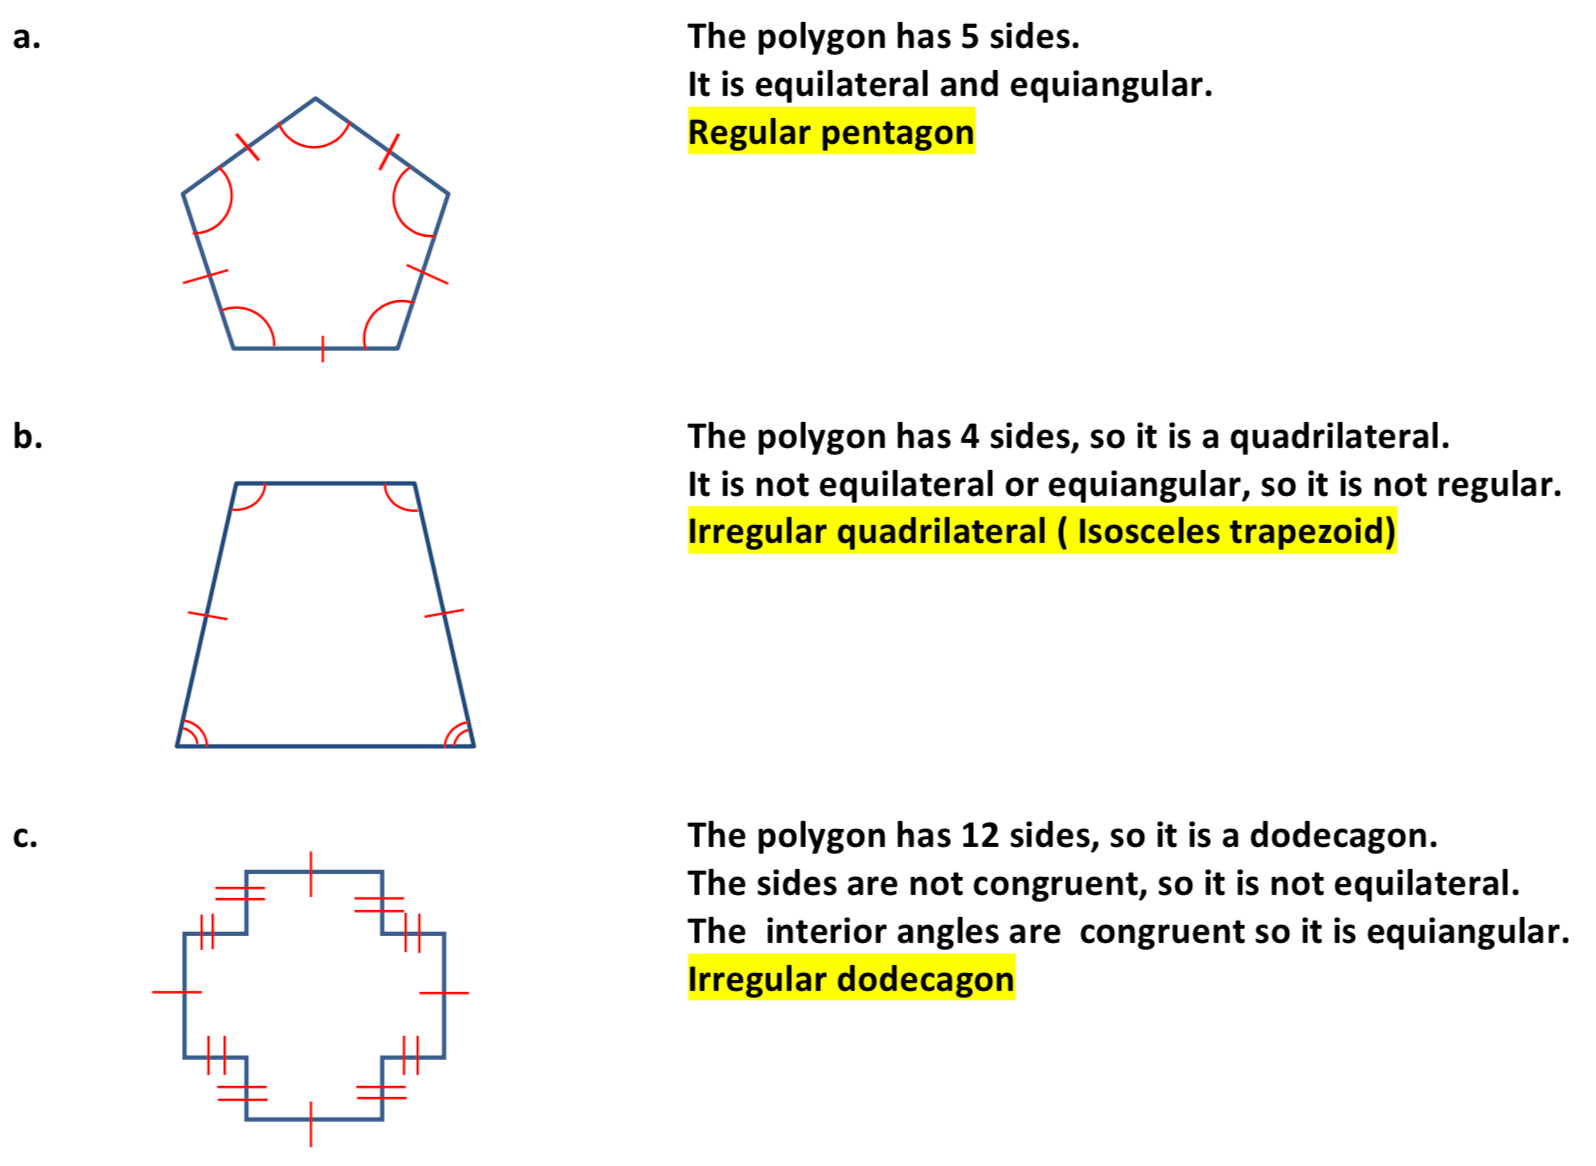 medium resolution of Classifying Polygons - Worksheet ⋆ GeometryCoach.com